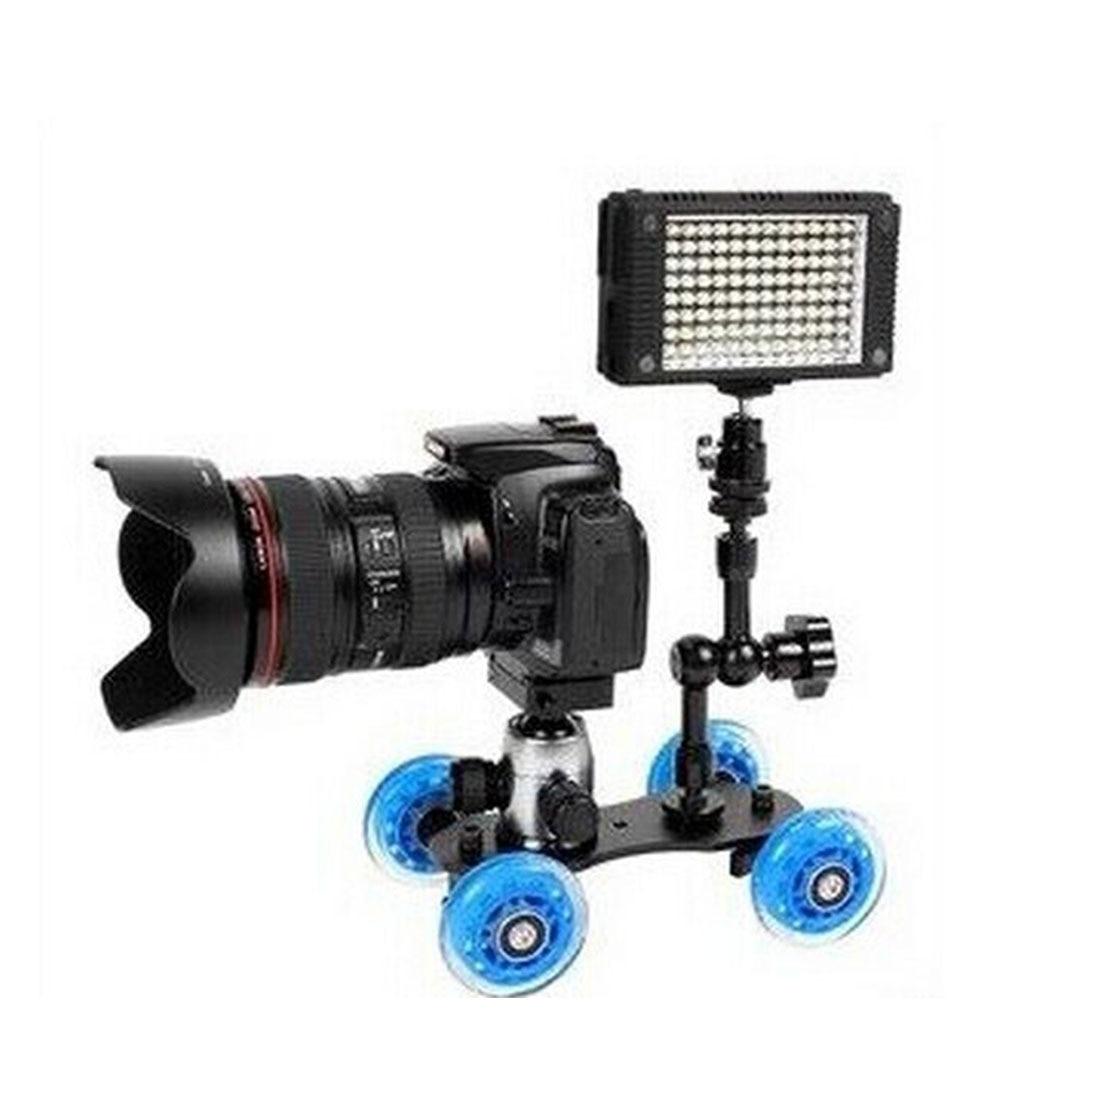 Centechia Four Wheeler Steadicam Stabilizer For Video Dslr Camera Camcorder For Canon Nikon Sony Gop